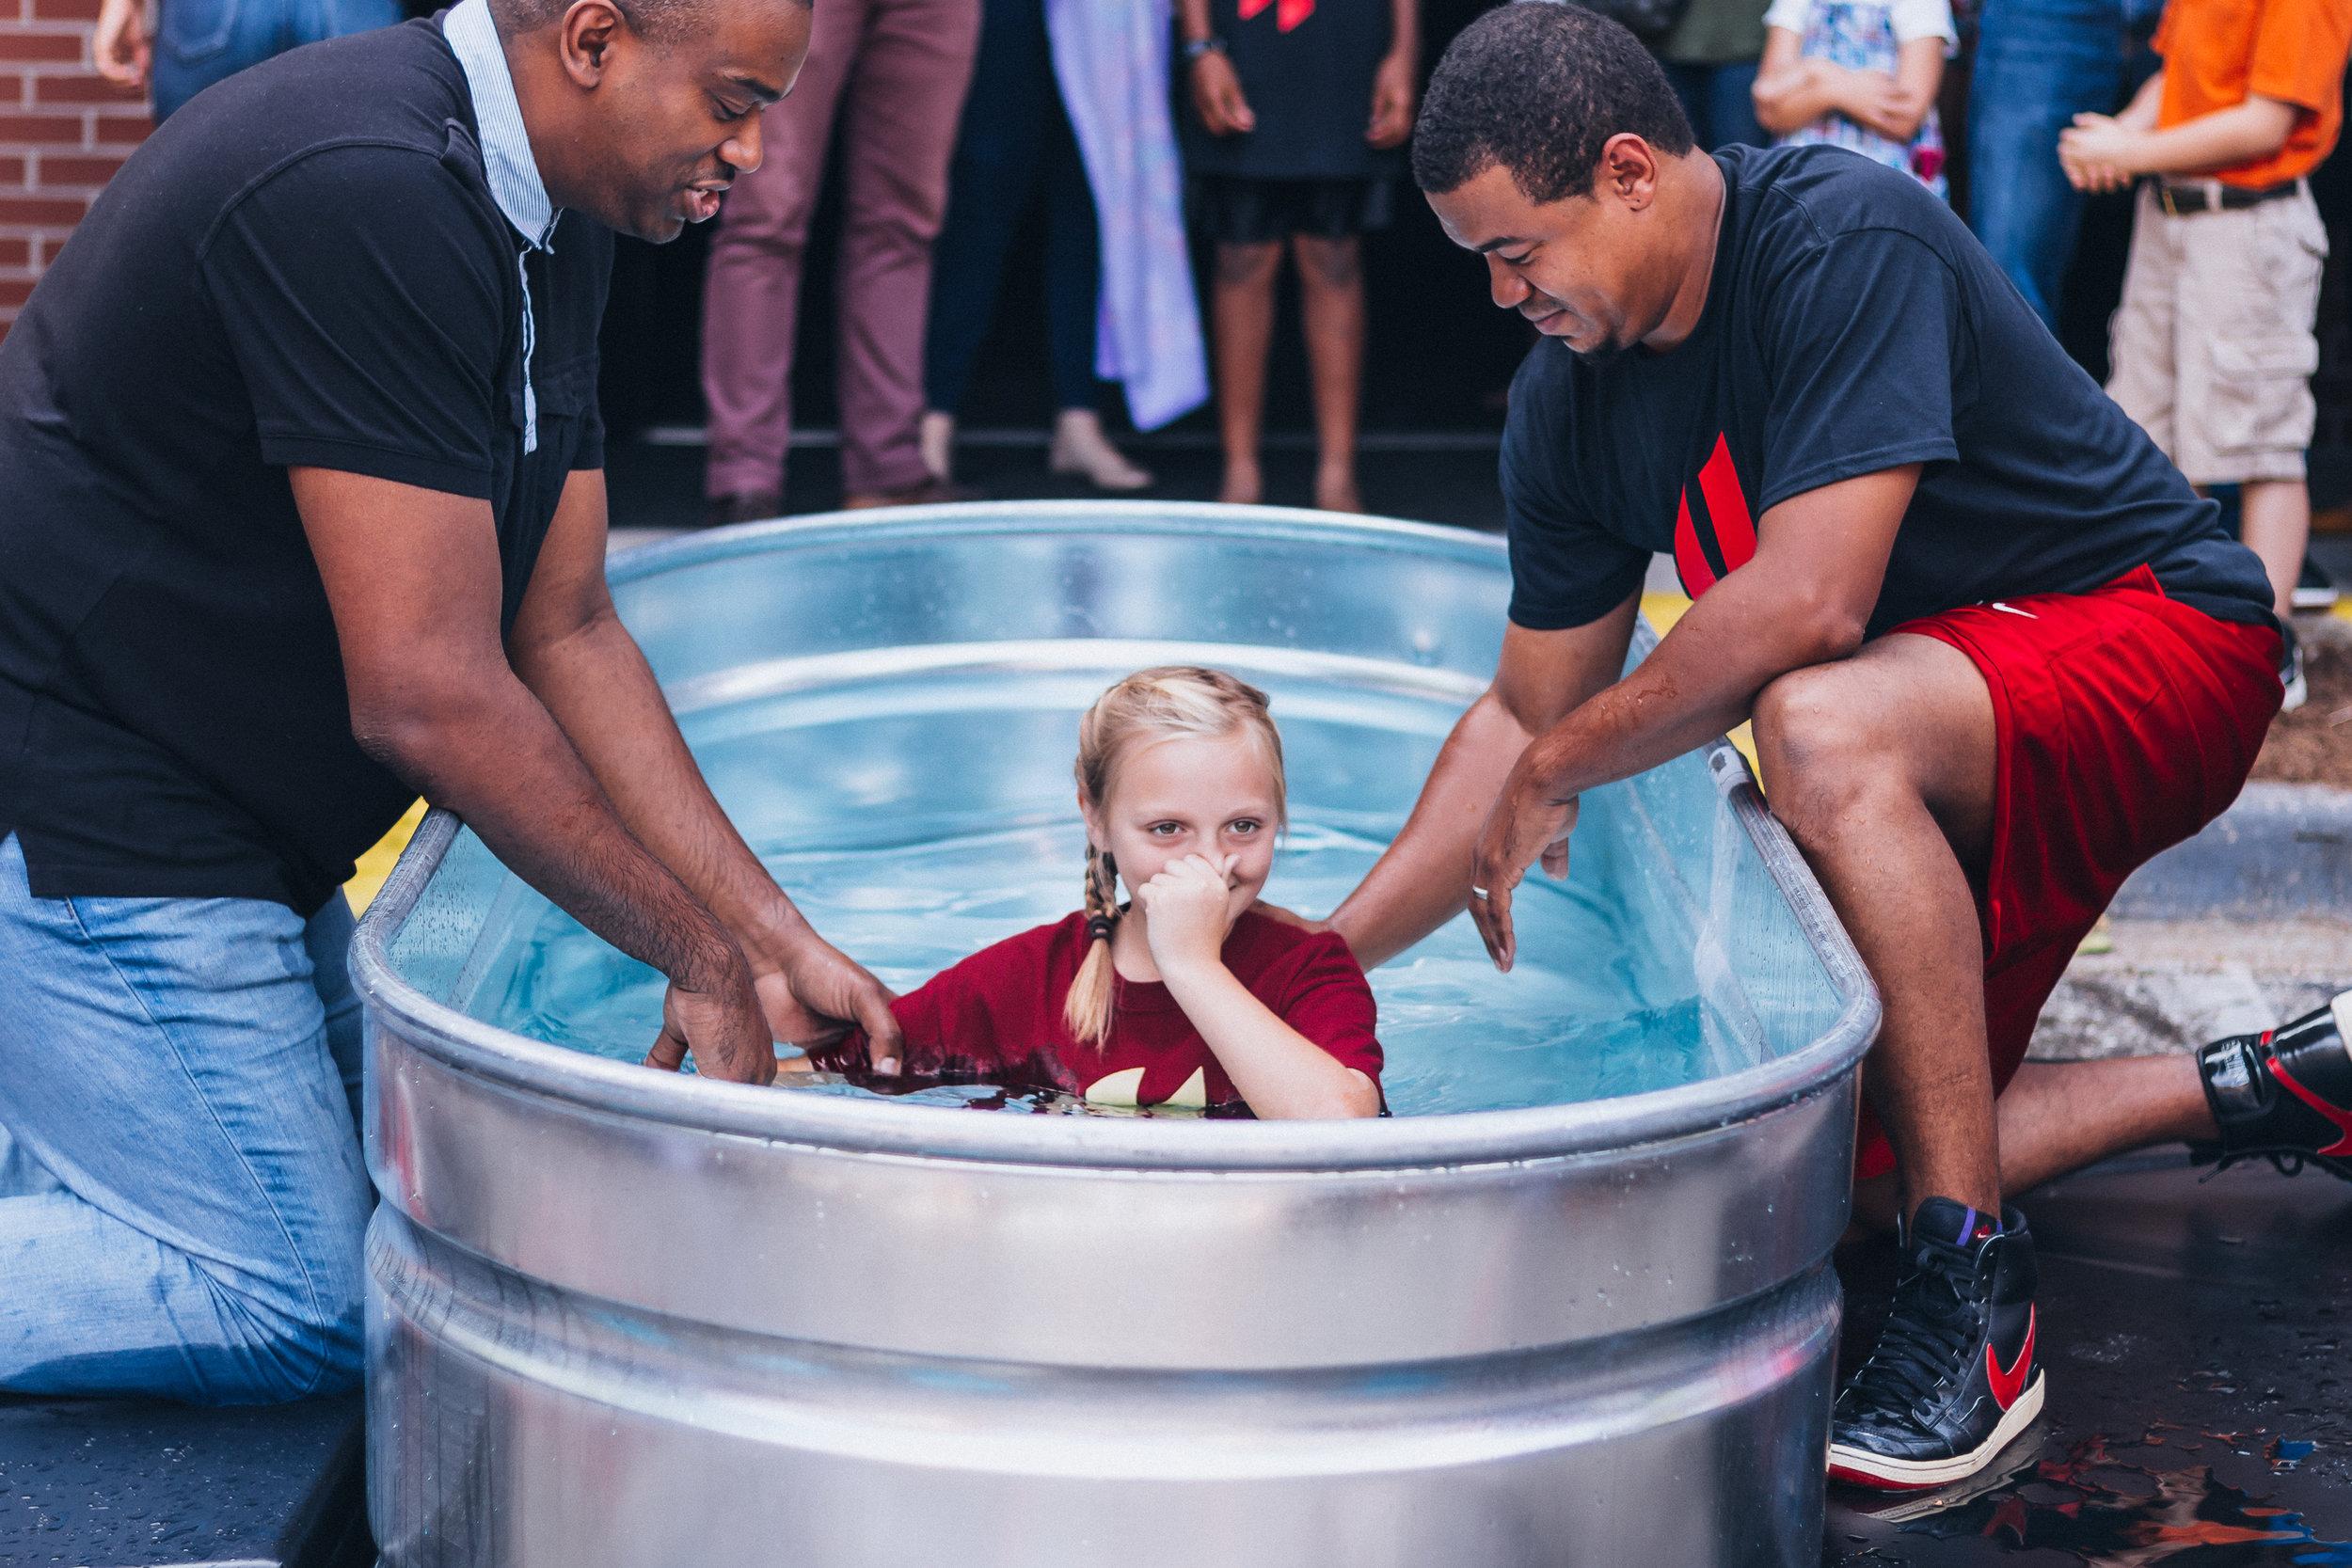 Paul's daughter, Payton, baptized at Engage Church